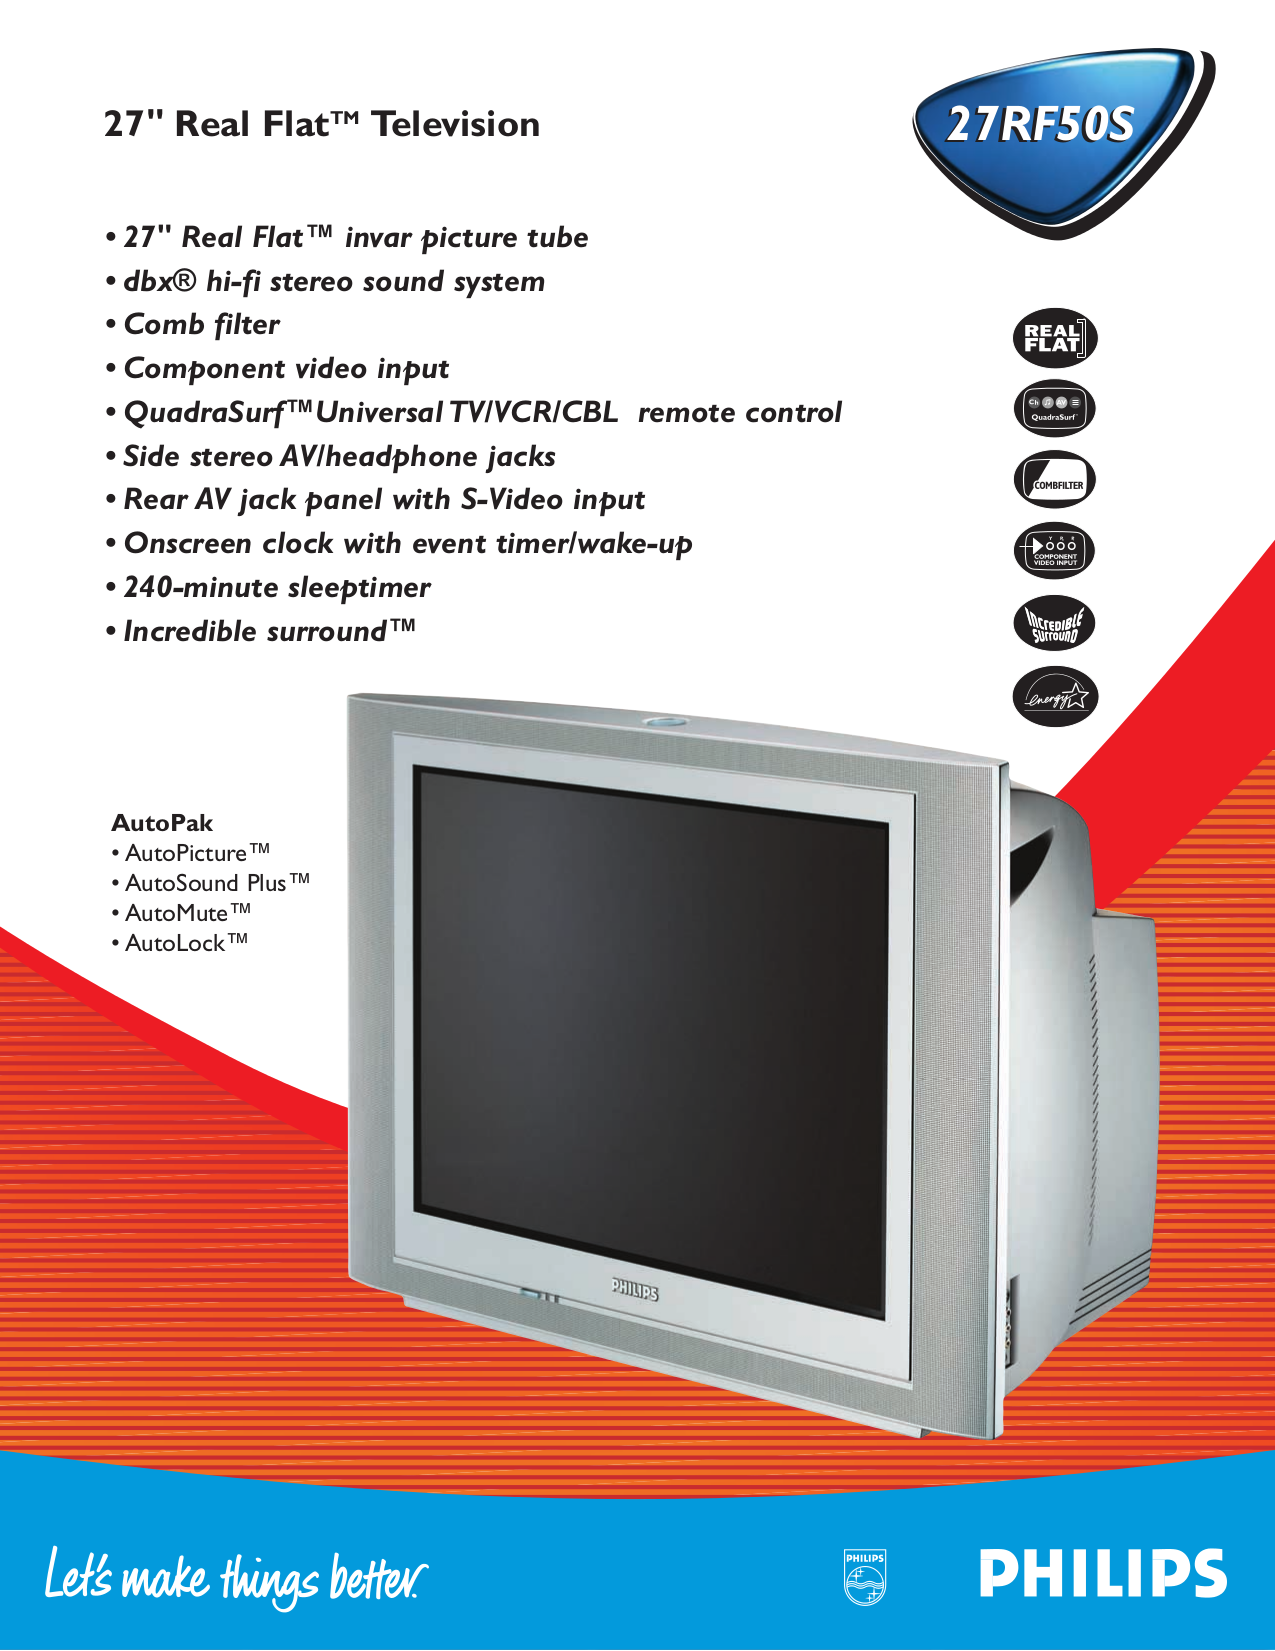 philips tv service manual free download pdf